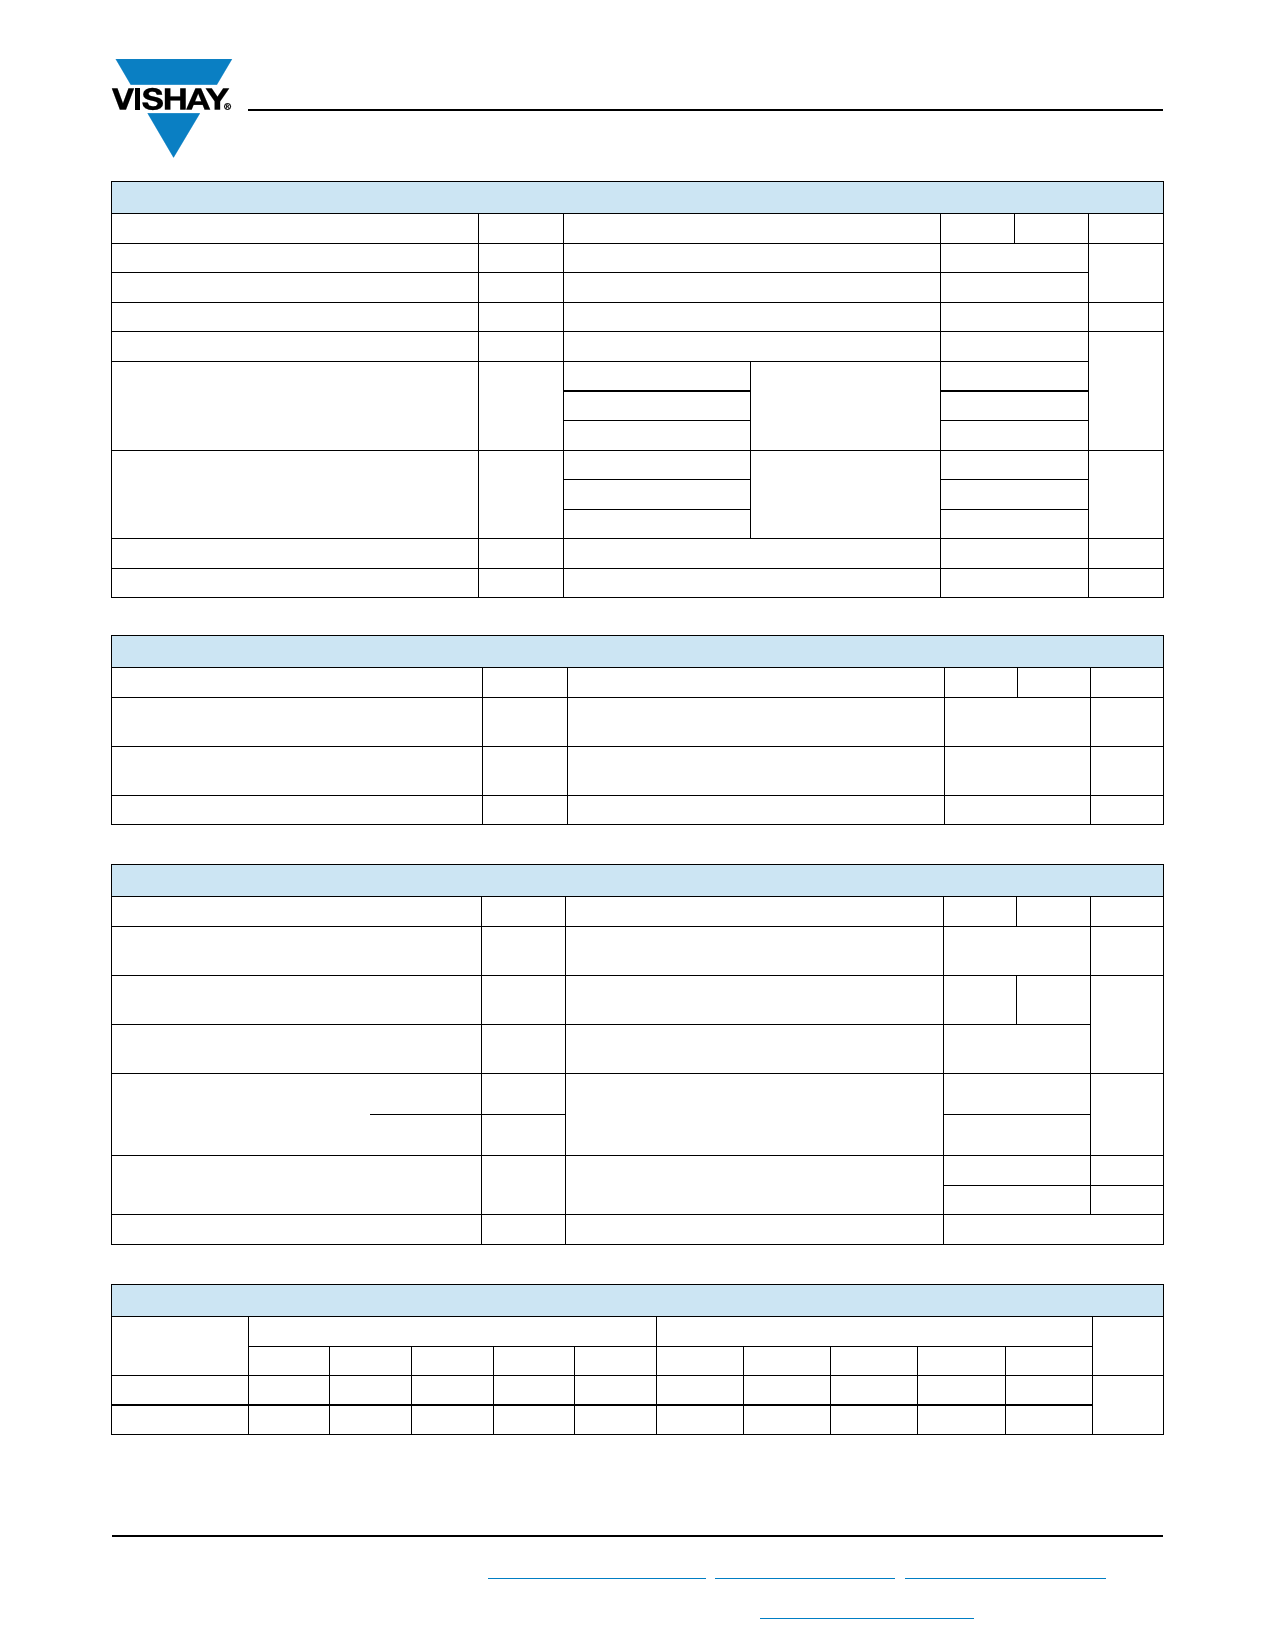 VSKT42-14P pdf, ピン配列